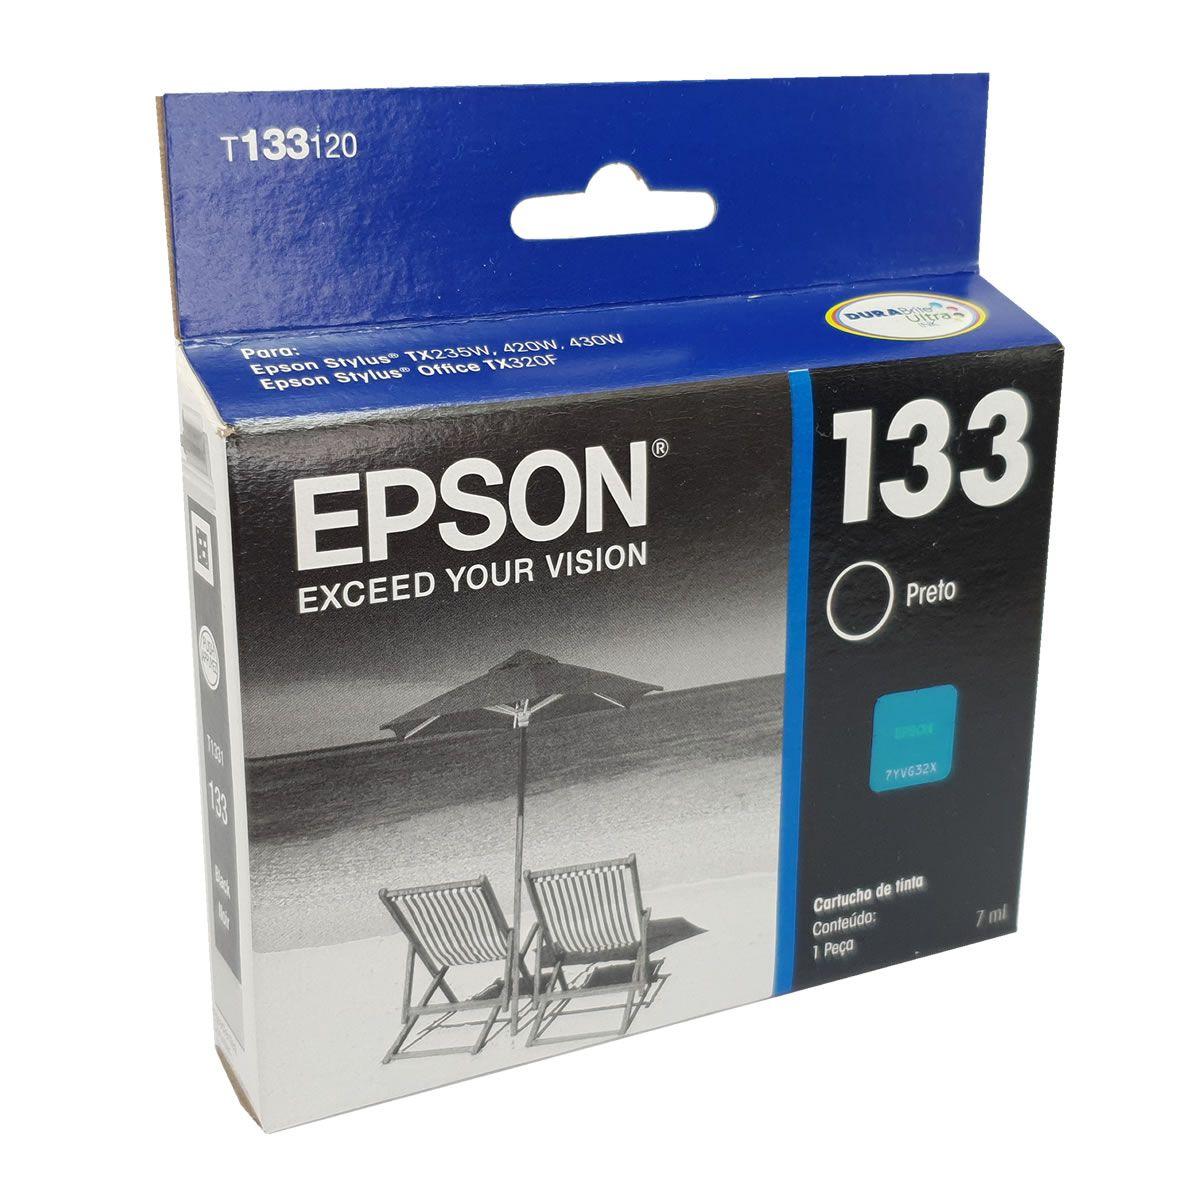 Cartucho EPSON T1331 133 Preto para T25 TX235W TX420W TX430W TX320F